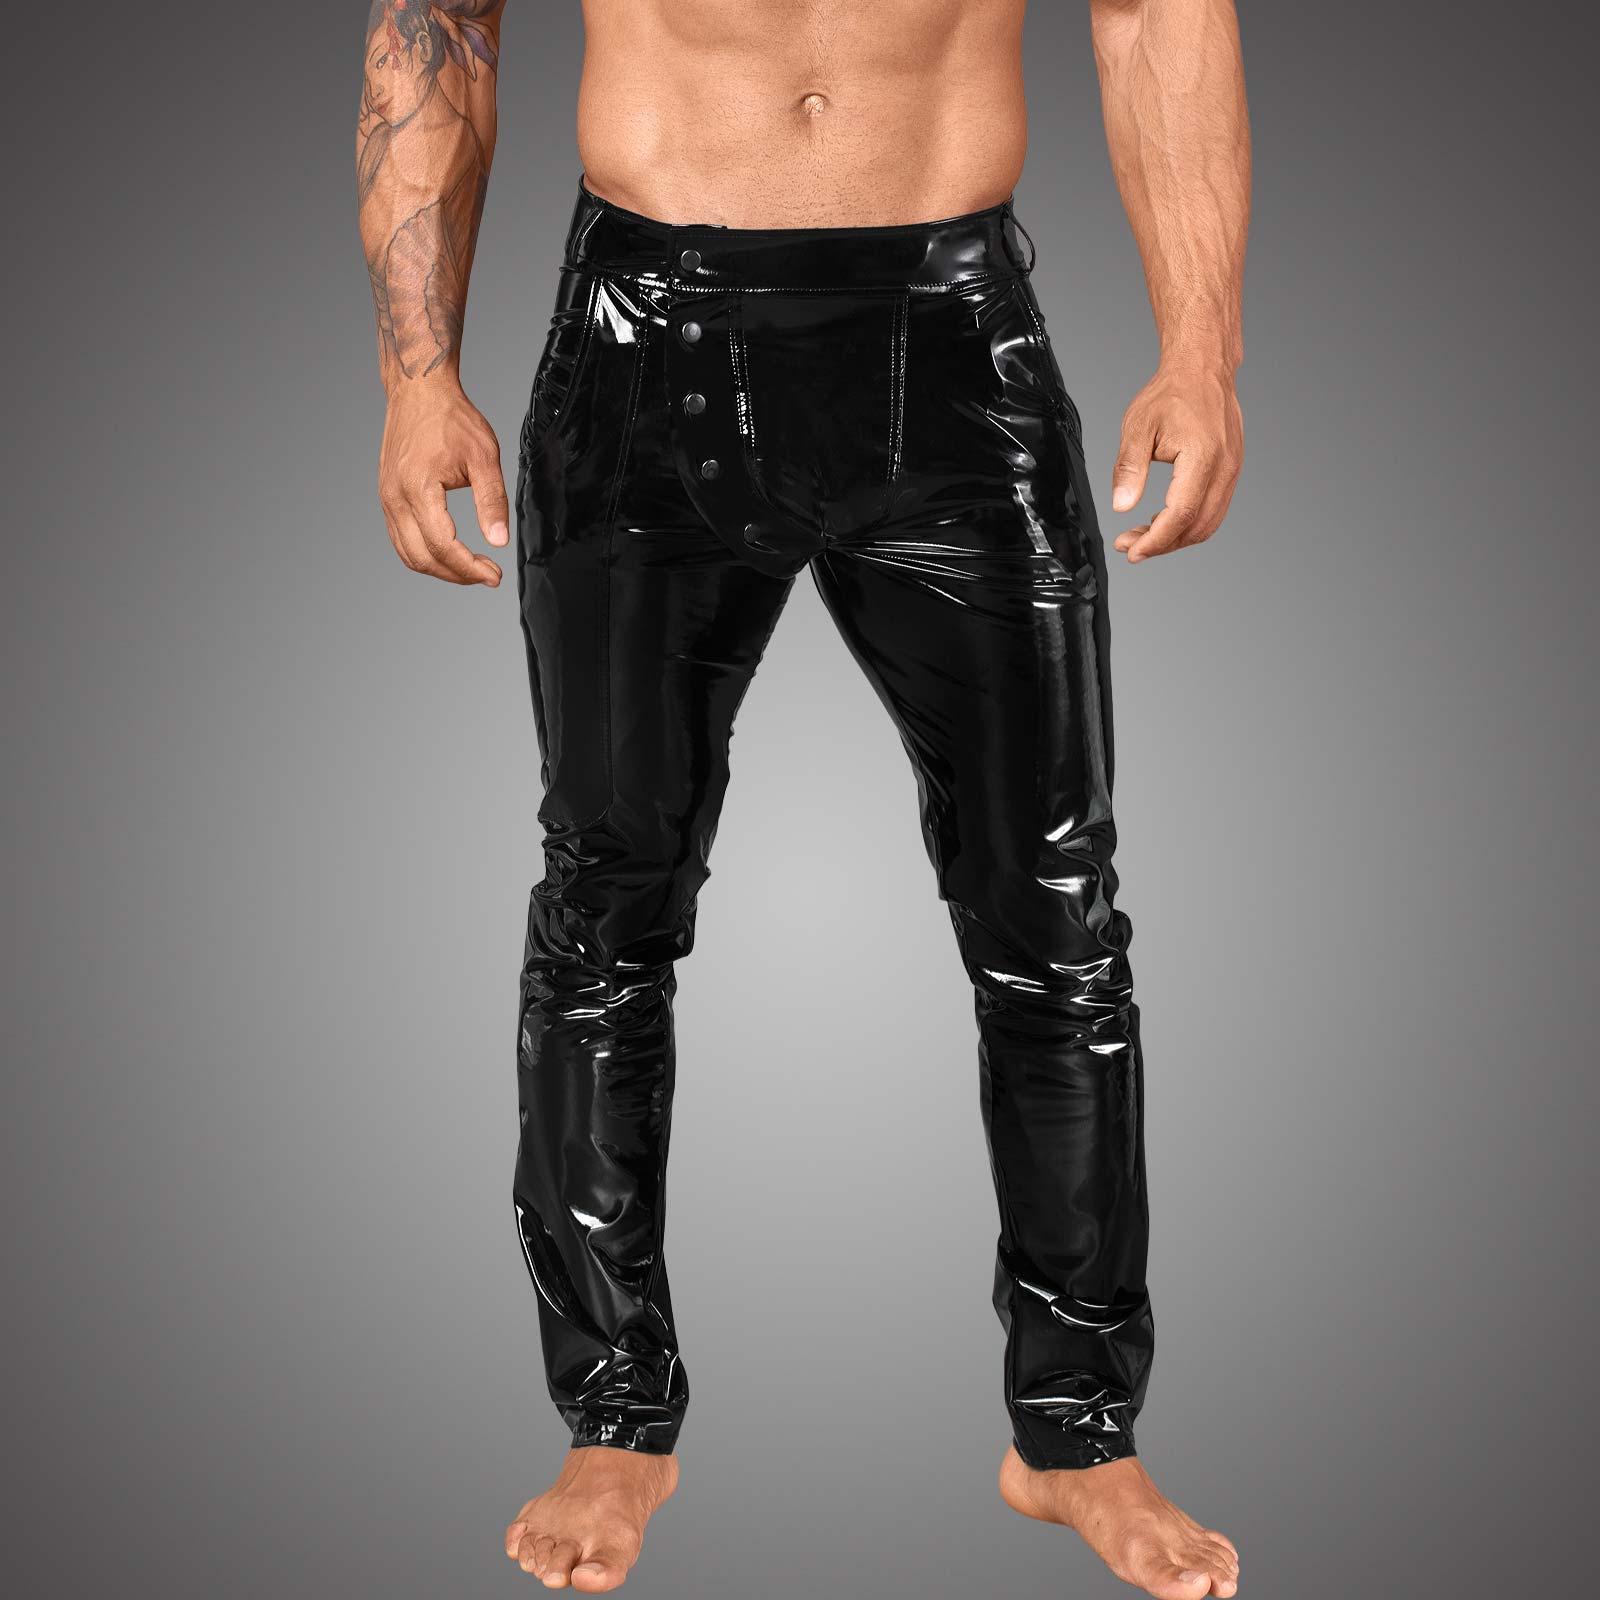 NOIR HANDMADE PVC Pants w/ Snap Side-Fly